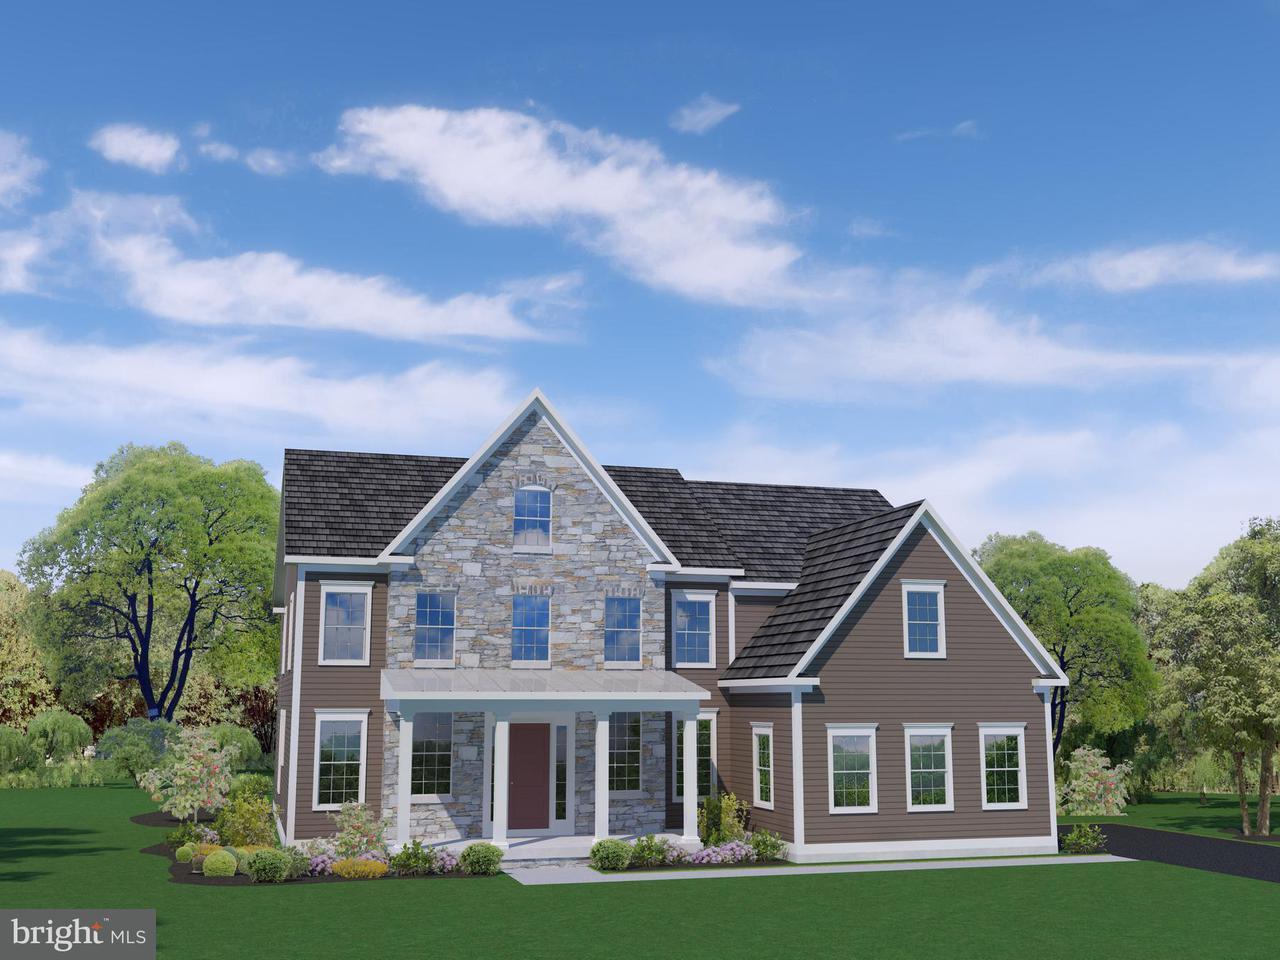 Single Family Home for Sale at 24596 BUCKWHEAT Lane 24596 BUCKWHEAT Lane Aldie, Virginia 20105 United States